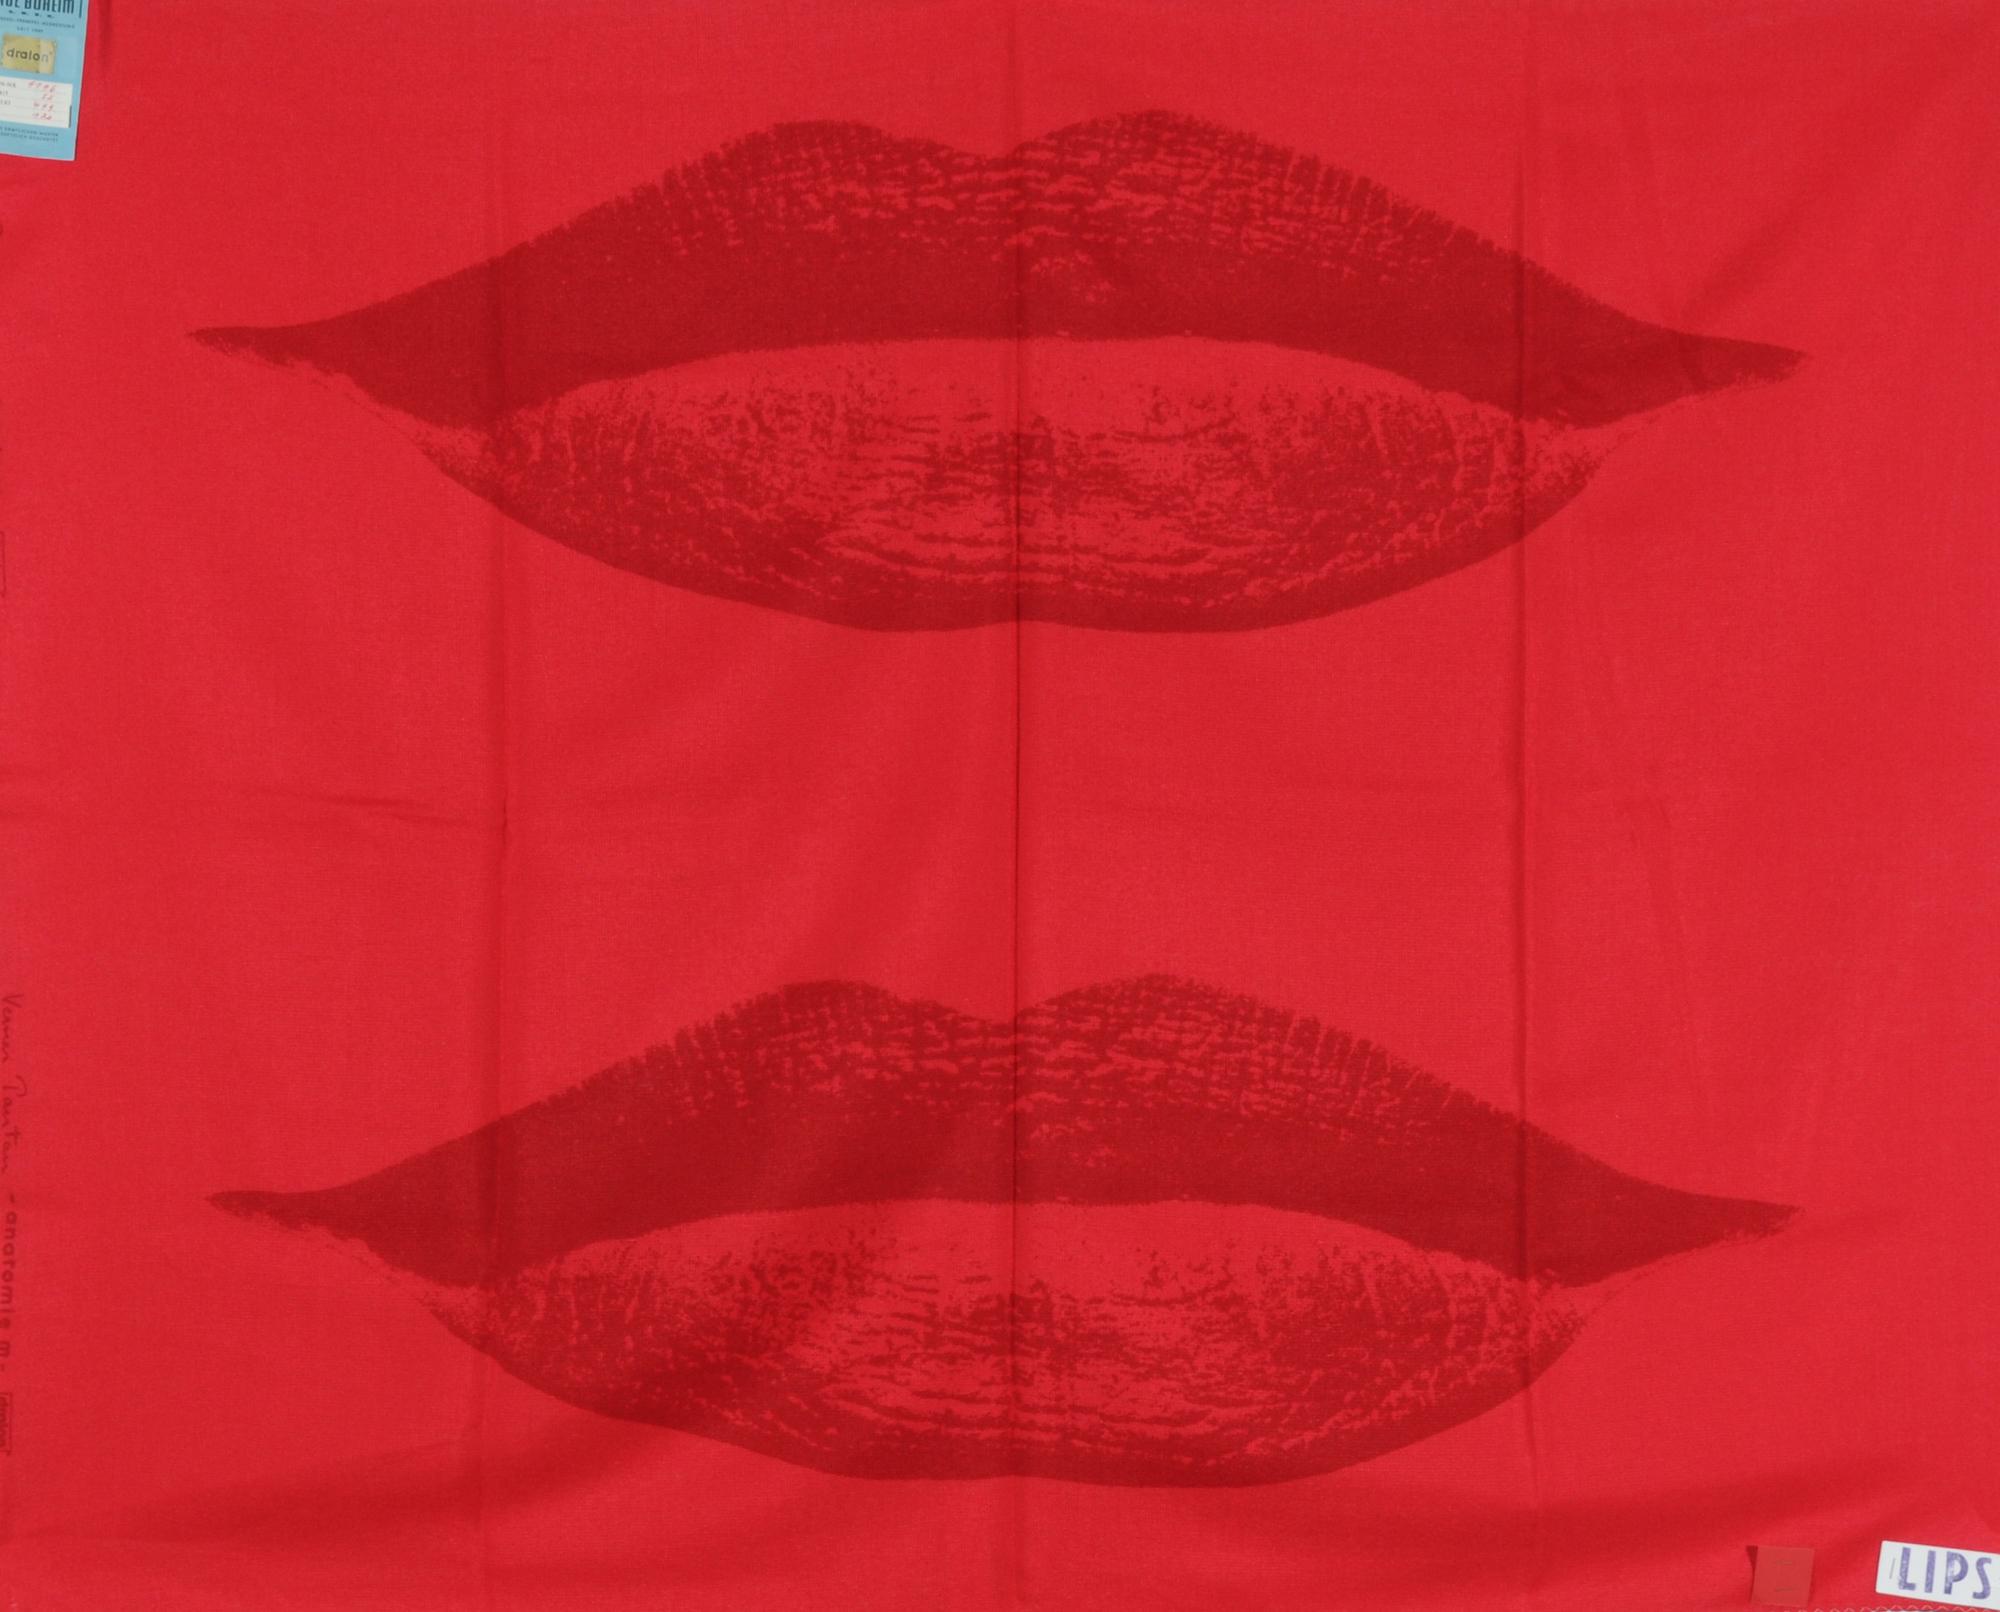 Panton Verner, Lips